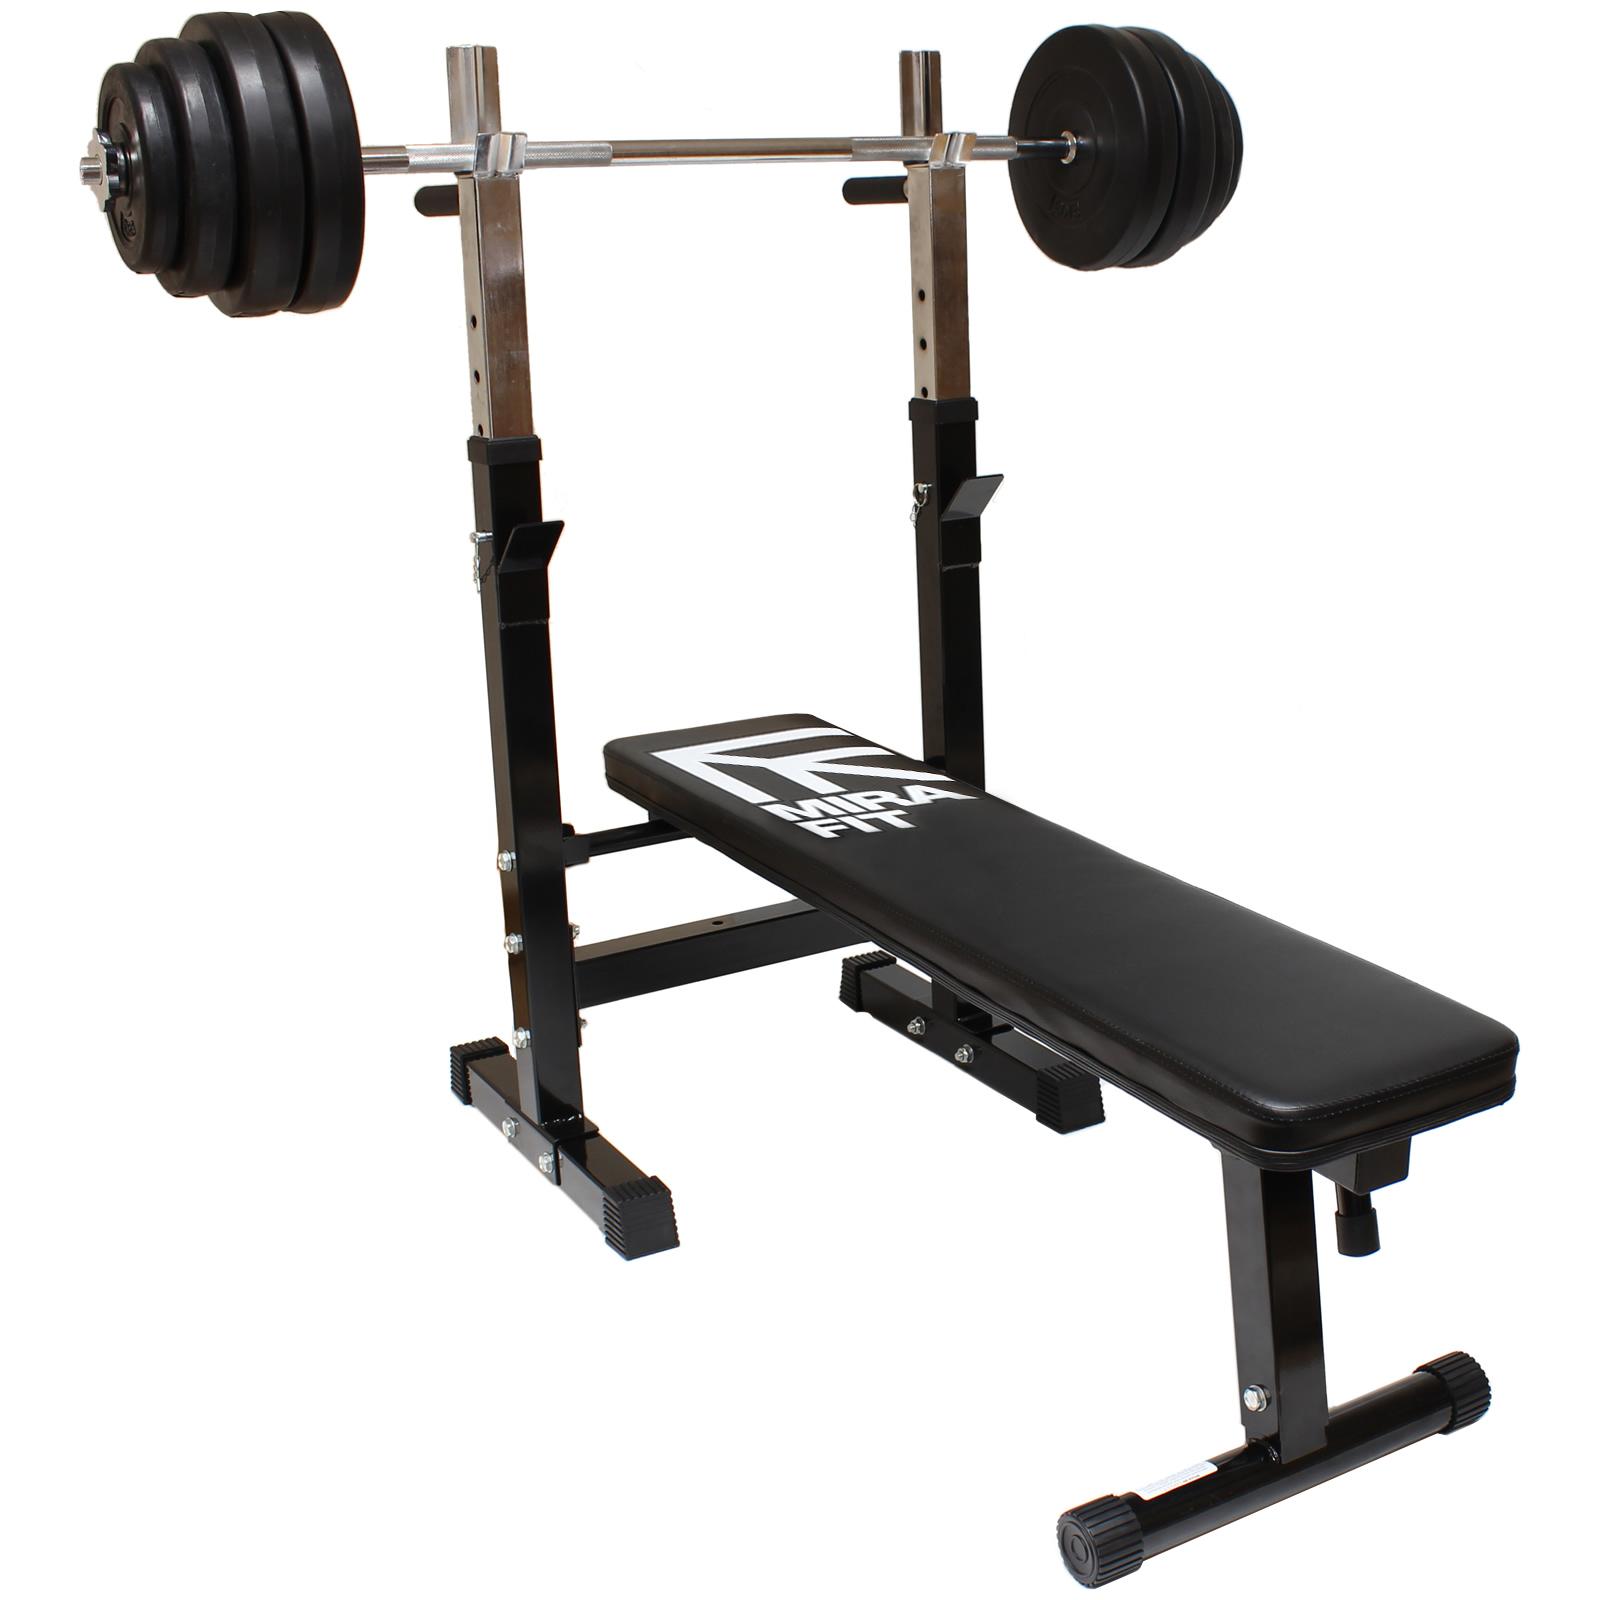 MIRAFIT Adjustable/Folding Flat Weight Bench & Dip Station